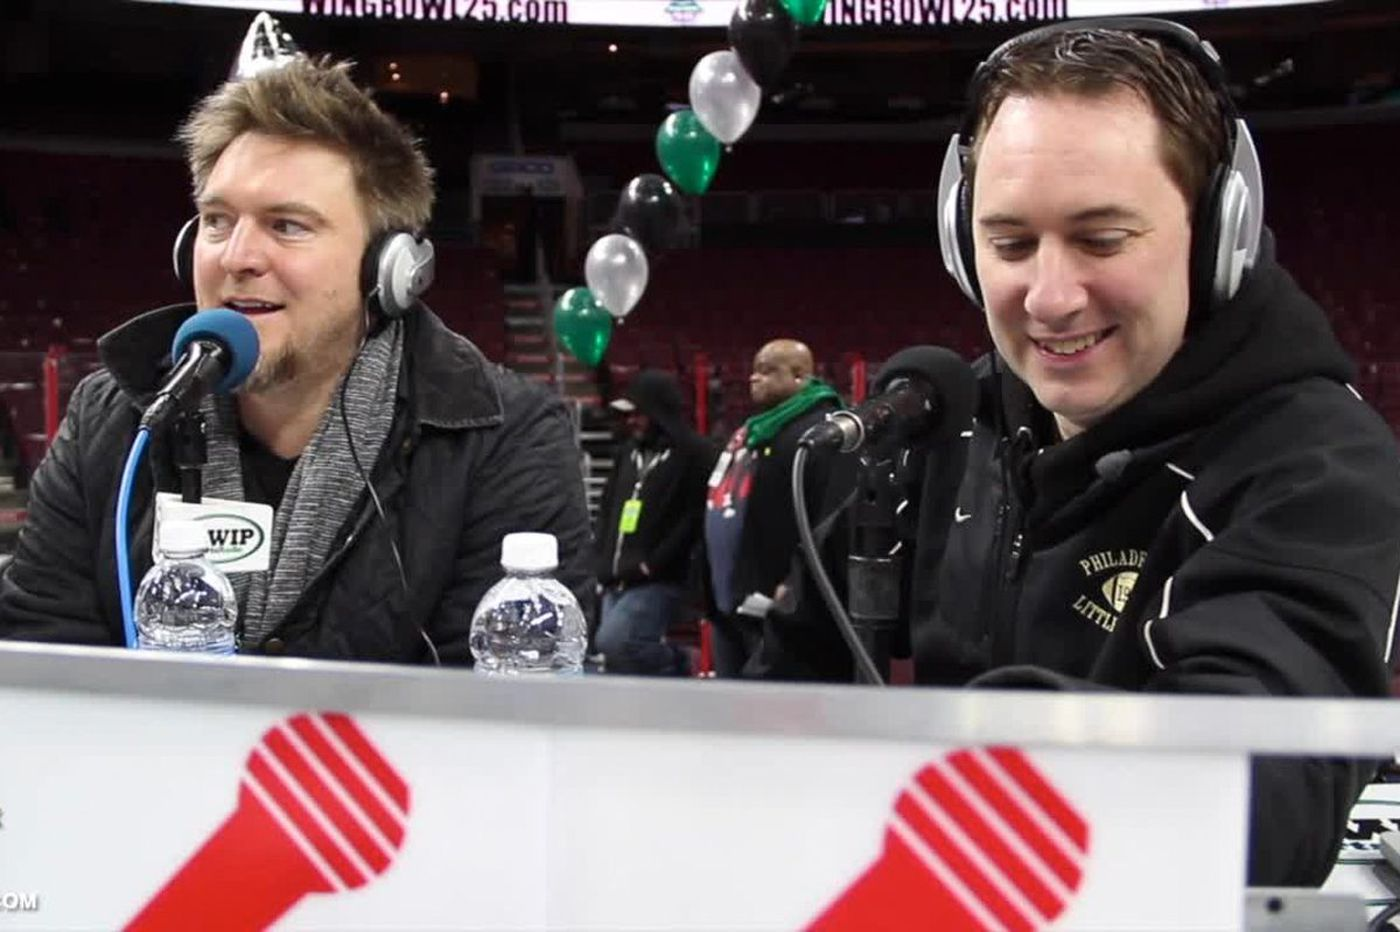 Philly sports radio ratings: DeCamara & Ritchie up big, Missanelli still ahead